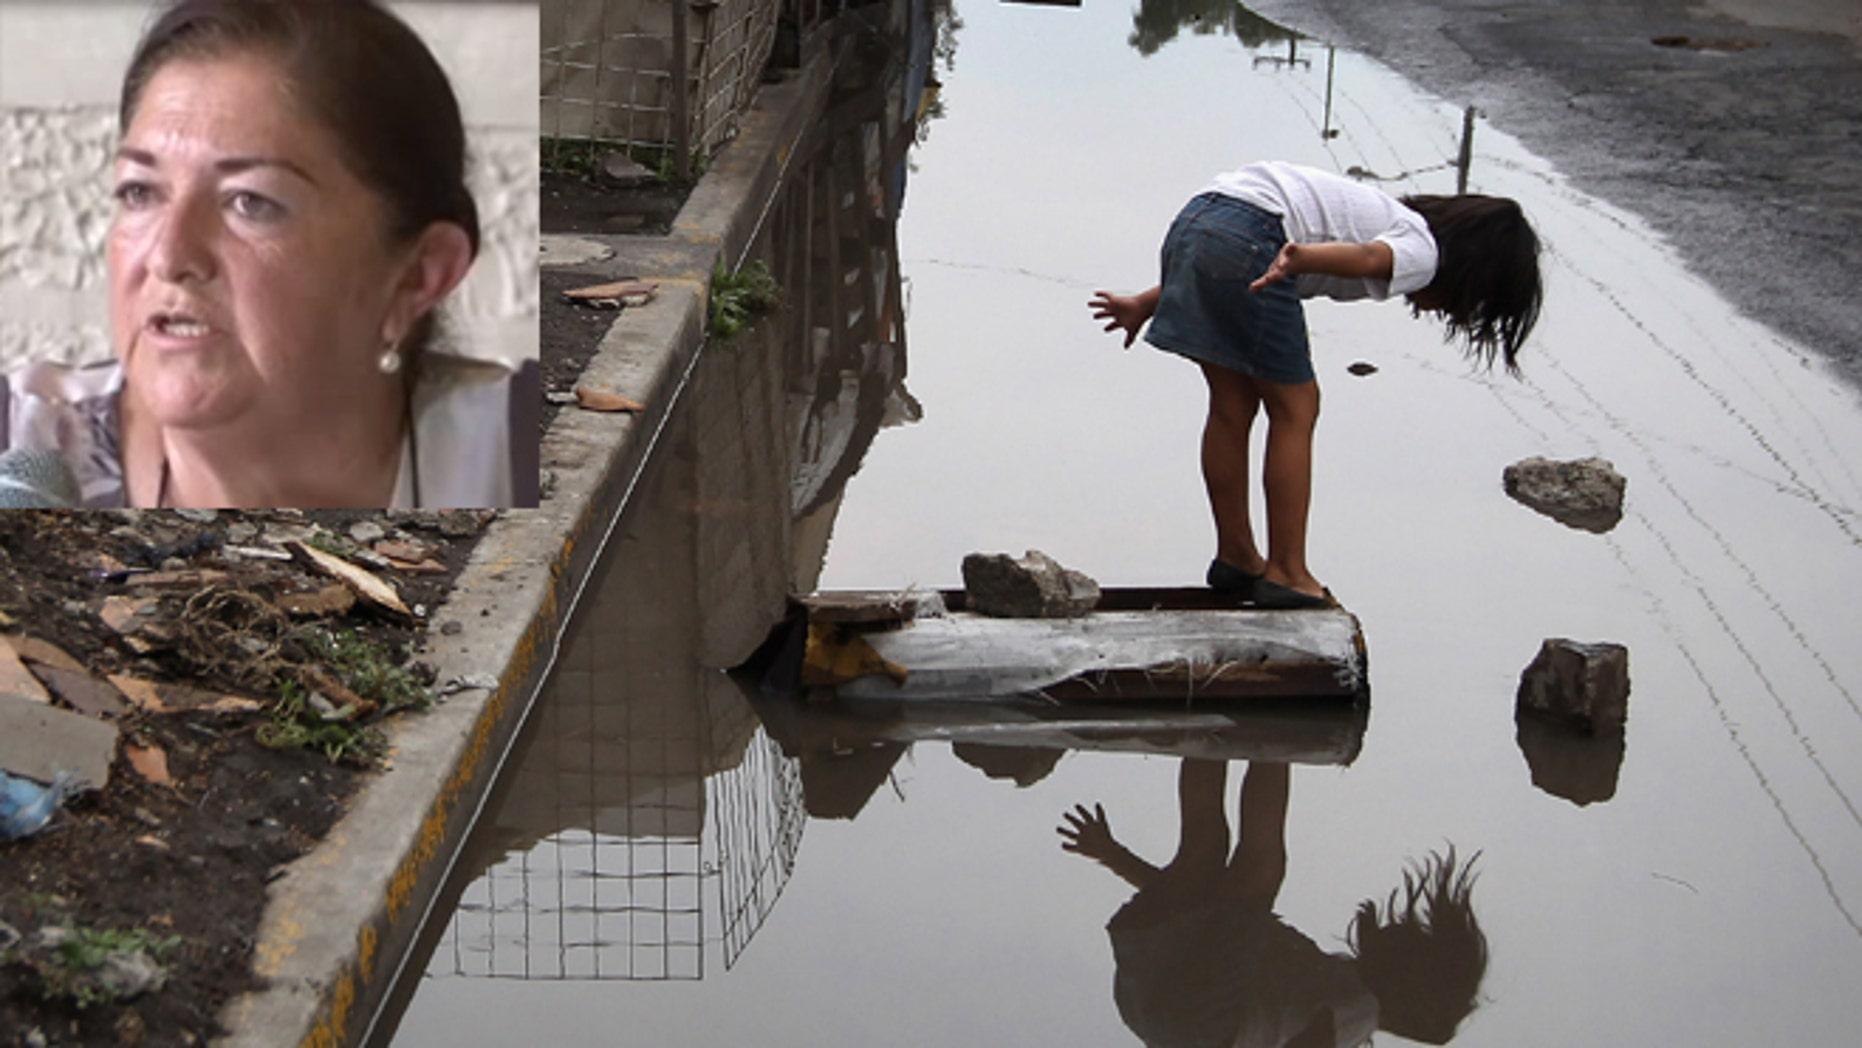 Tecamachalco, Puebla is experiencing an increase in homelessness. Inset: Councilwoman Olga Gutiérrez Machorro. (Main photo by John Moore/Getty Images; Gutiérrez Machorro: Via YouTube)